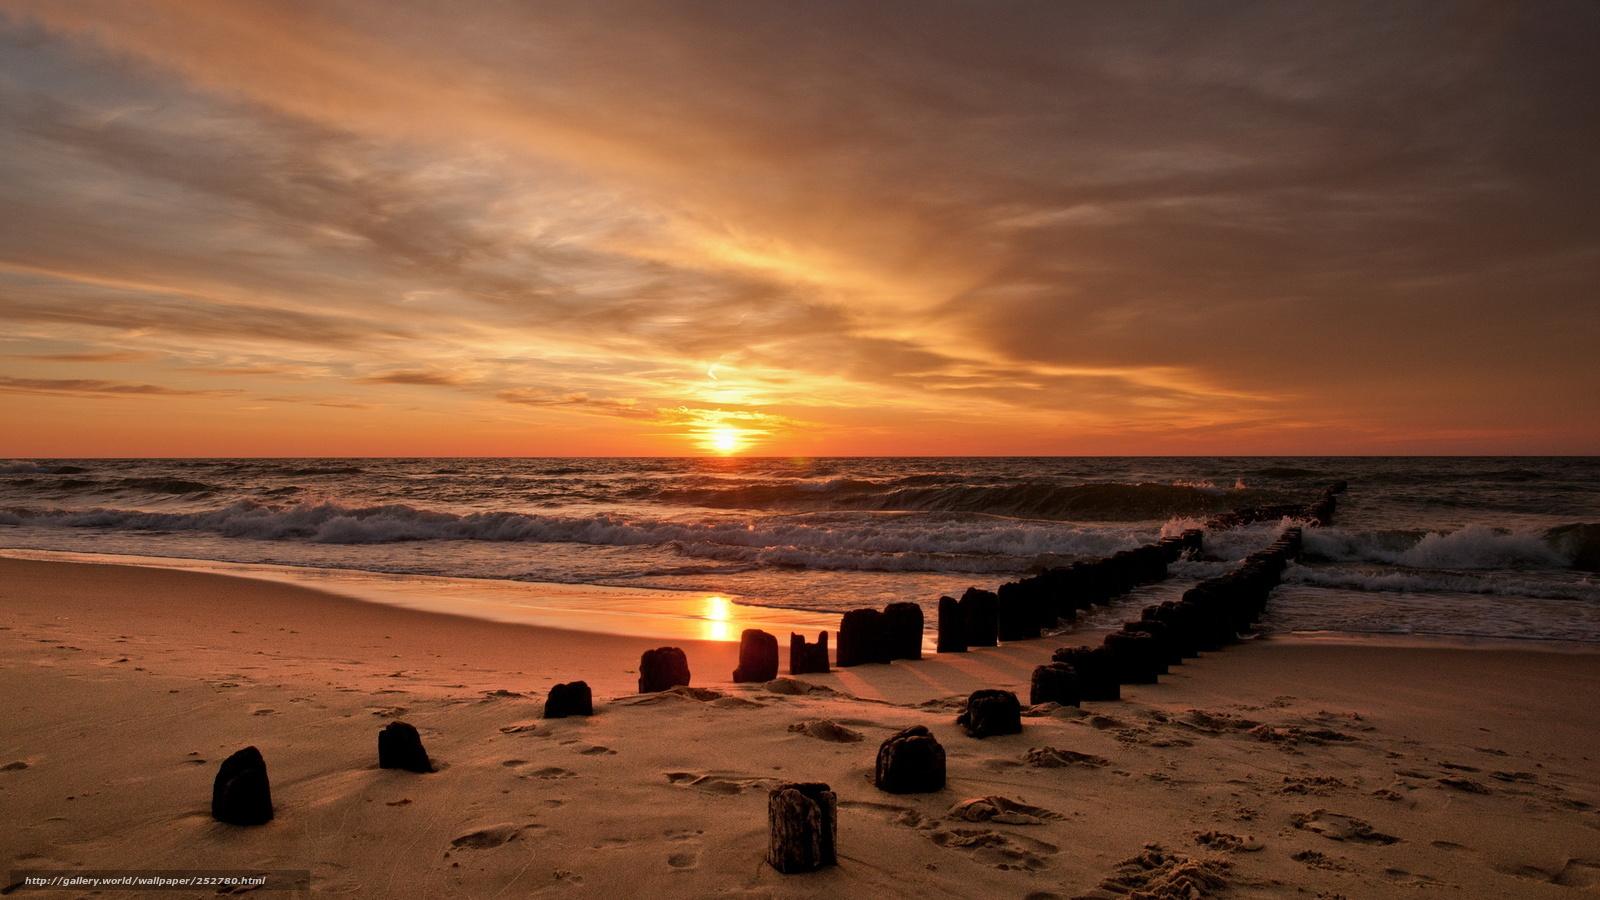 Tlcharger fond d 39 ecran coucher du soleil mer ciel fonds for Fond ecran gratuit mer